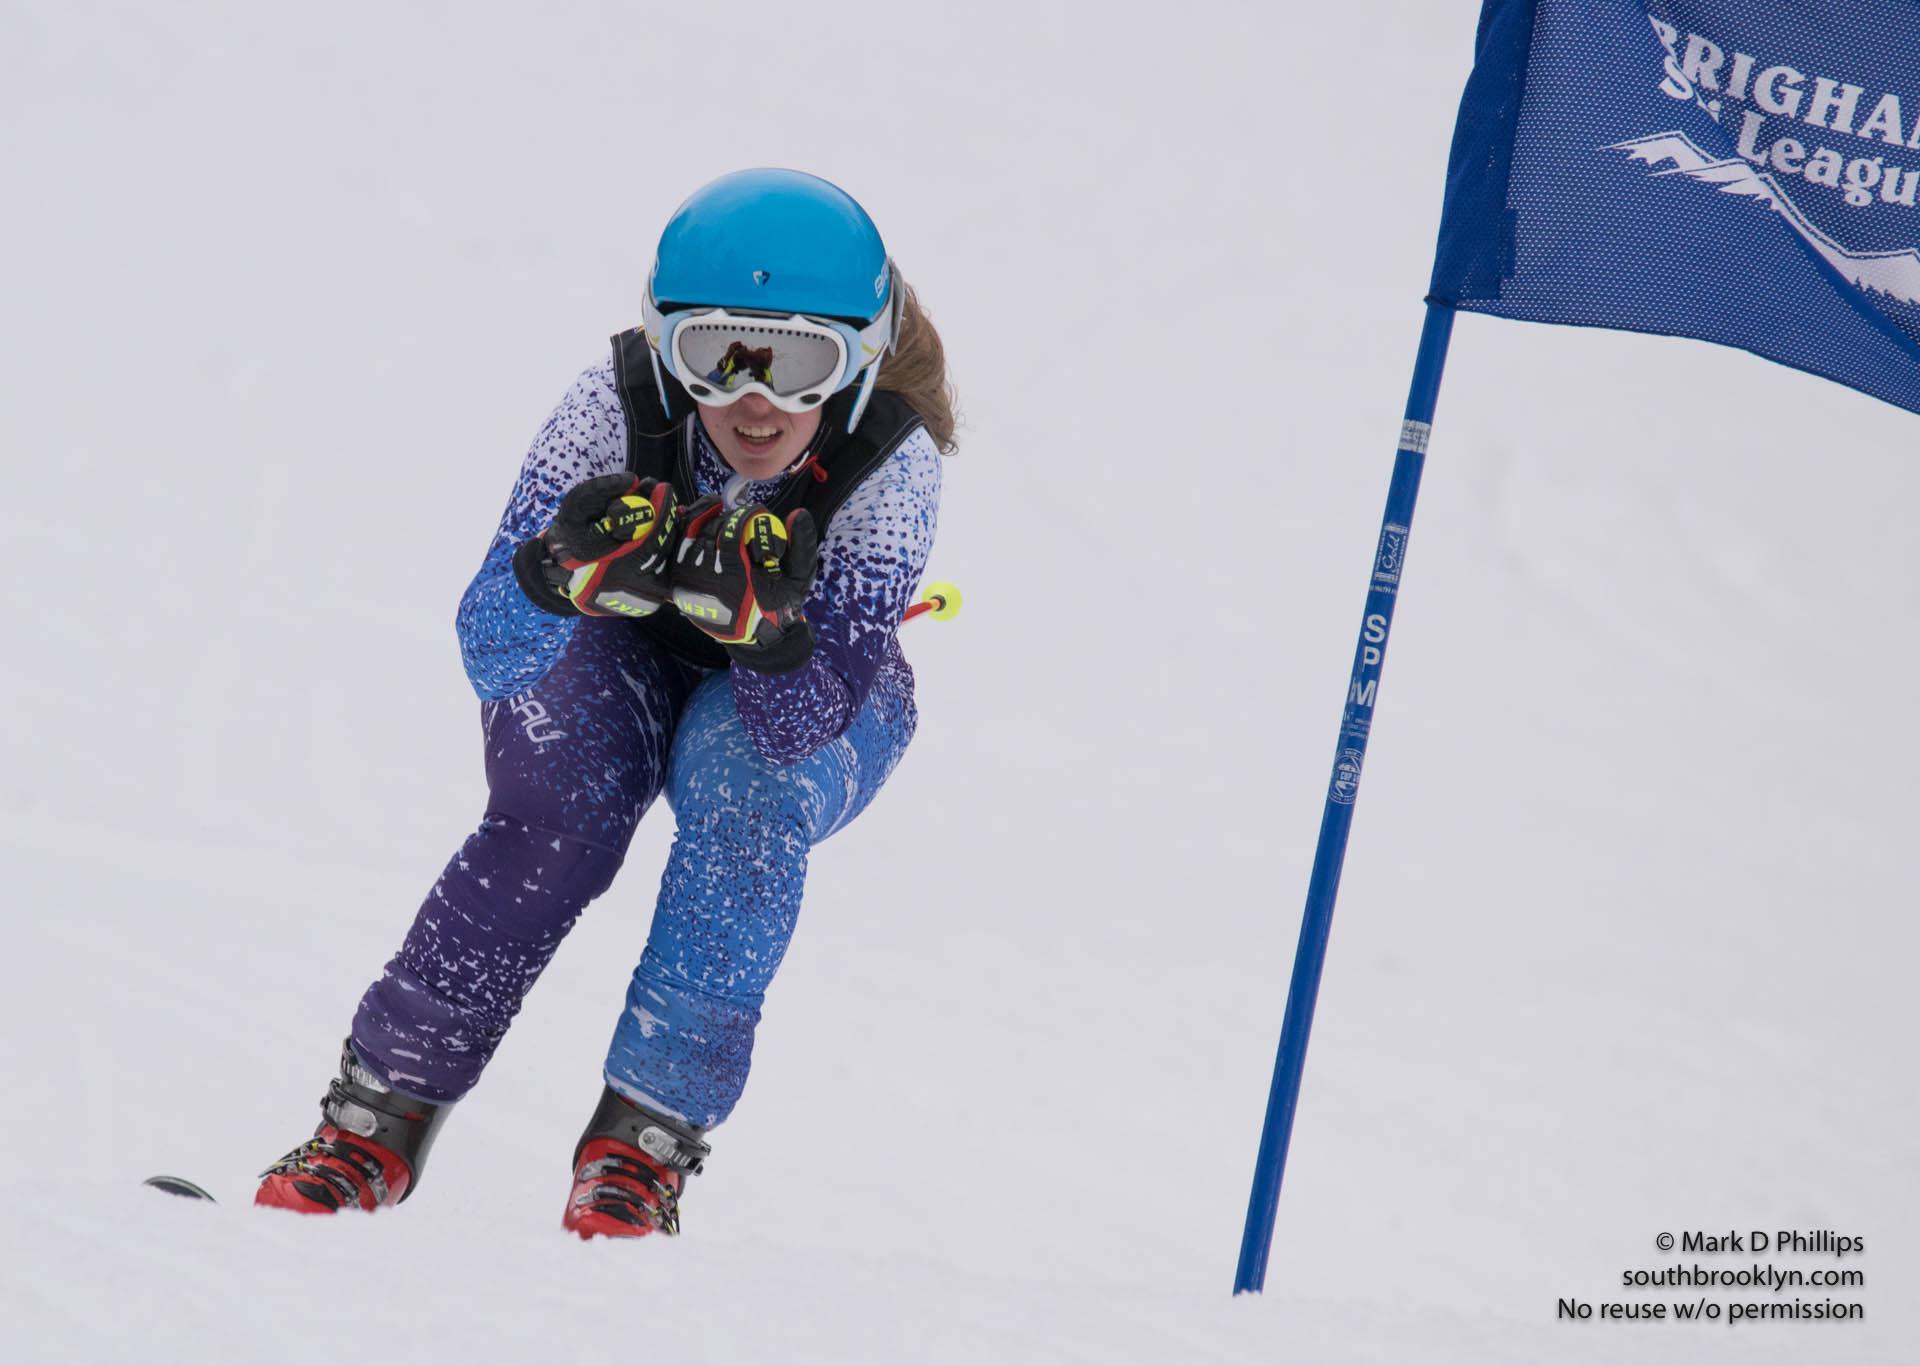 ElizaPhillips_skiing_crMarkDPhillips